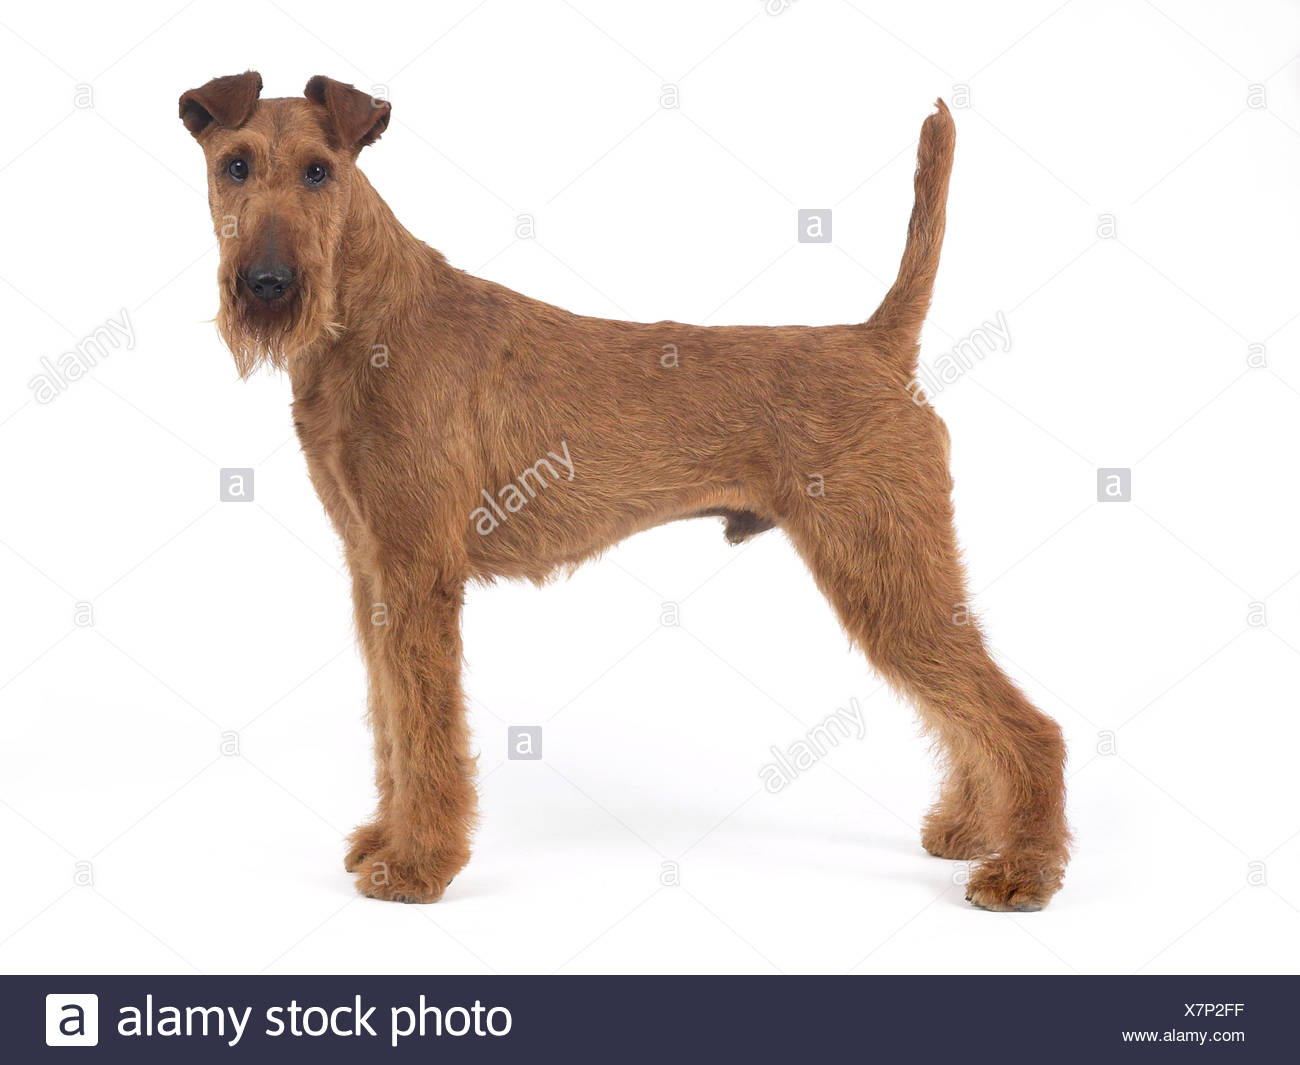 An irish terrier standing. - Stock Image